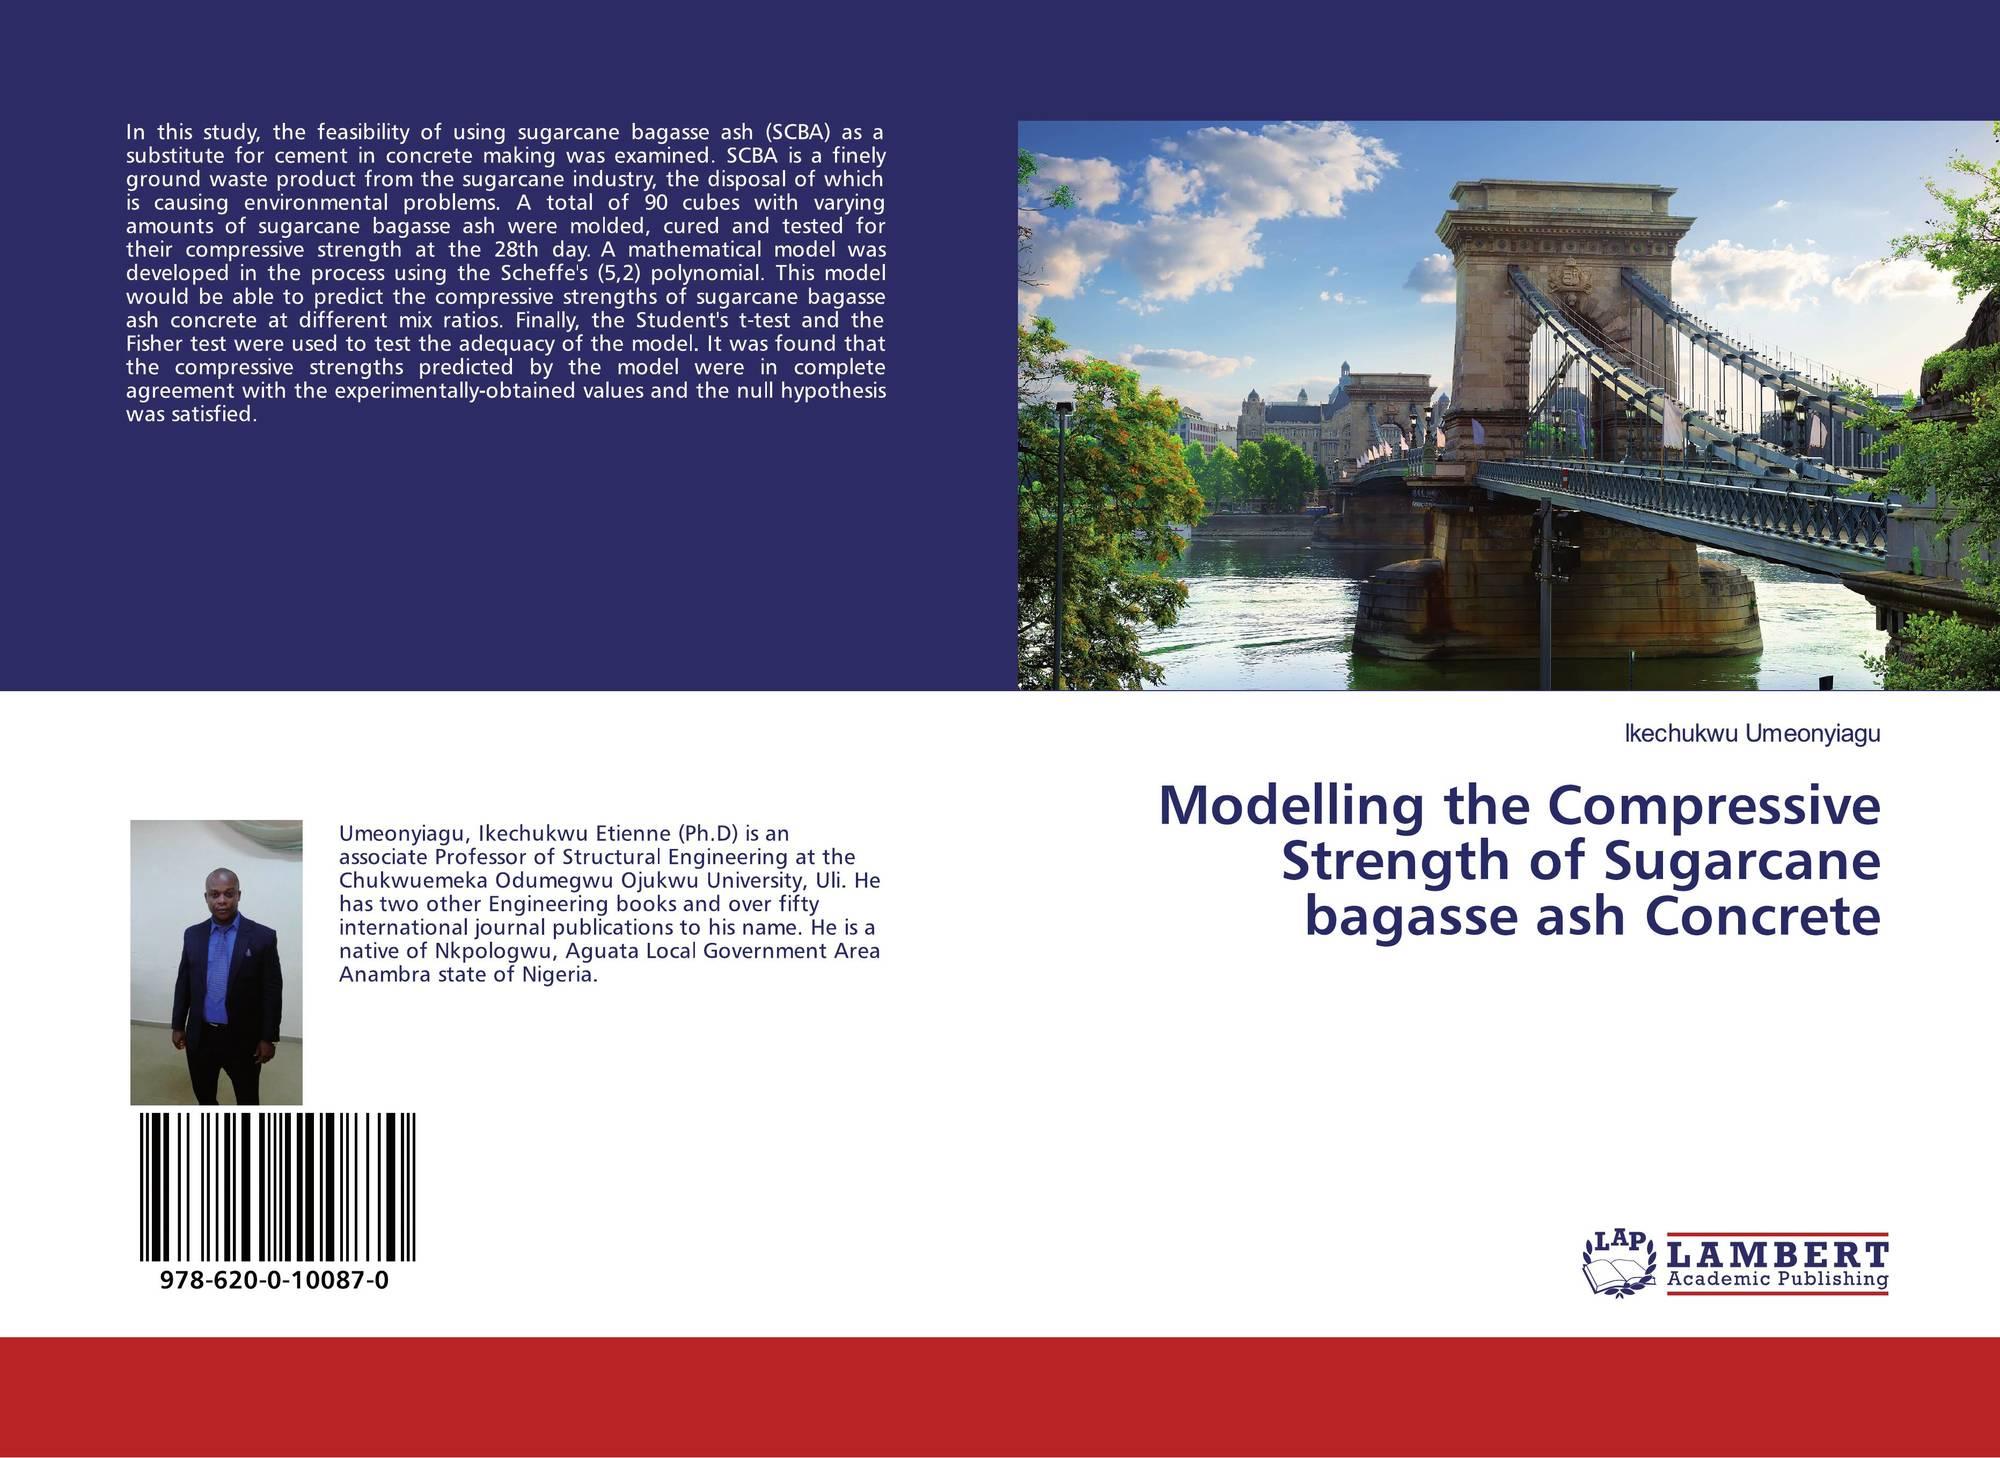 LAP LAMBERT Academic Publishing - 162726 Products   Page 79  